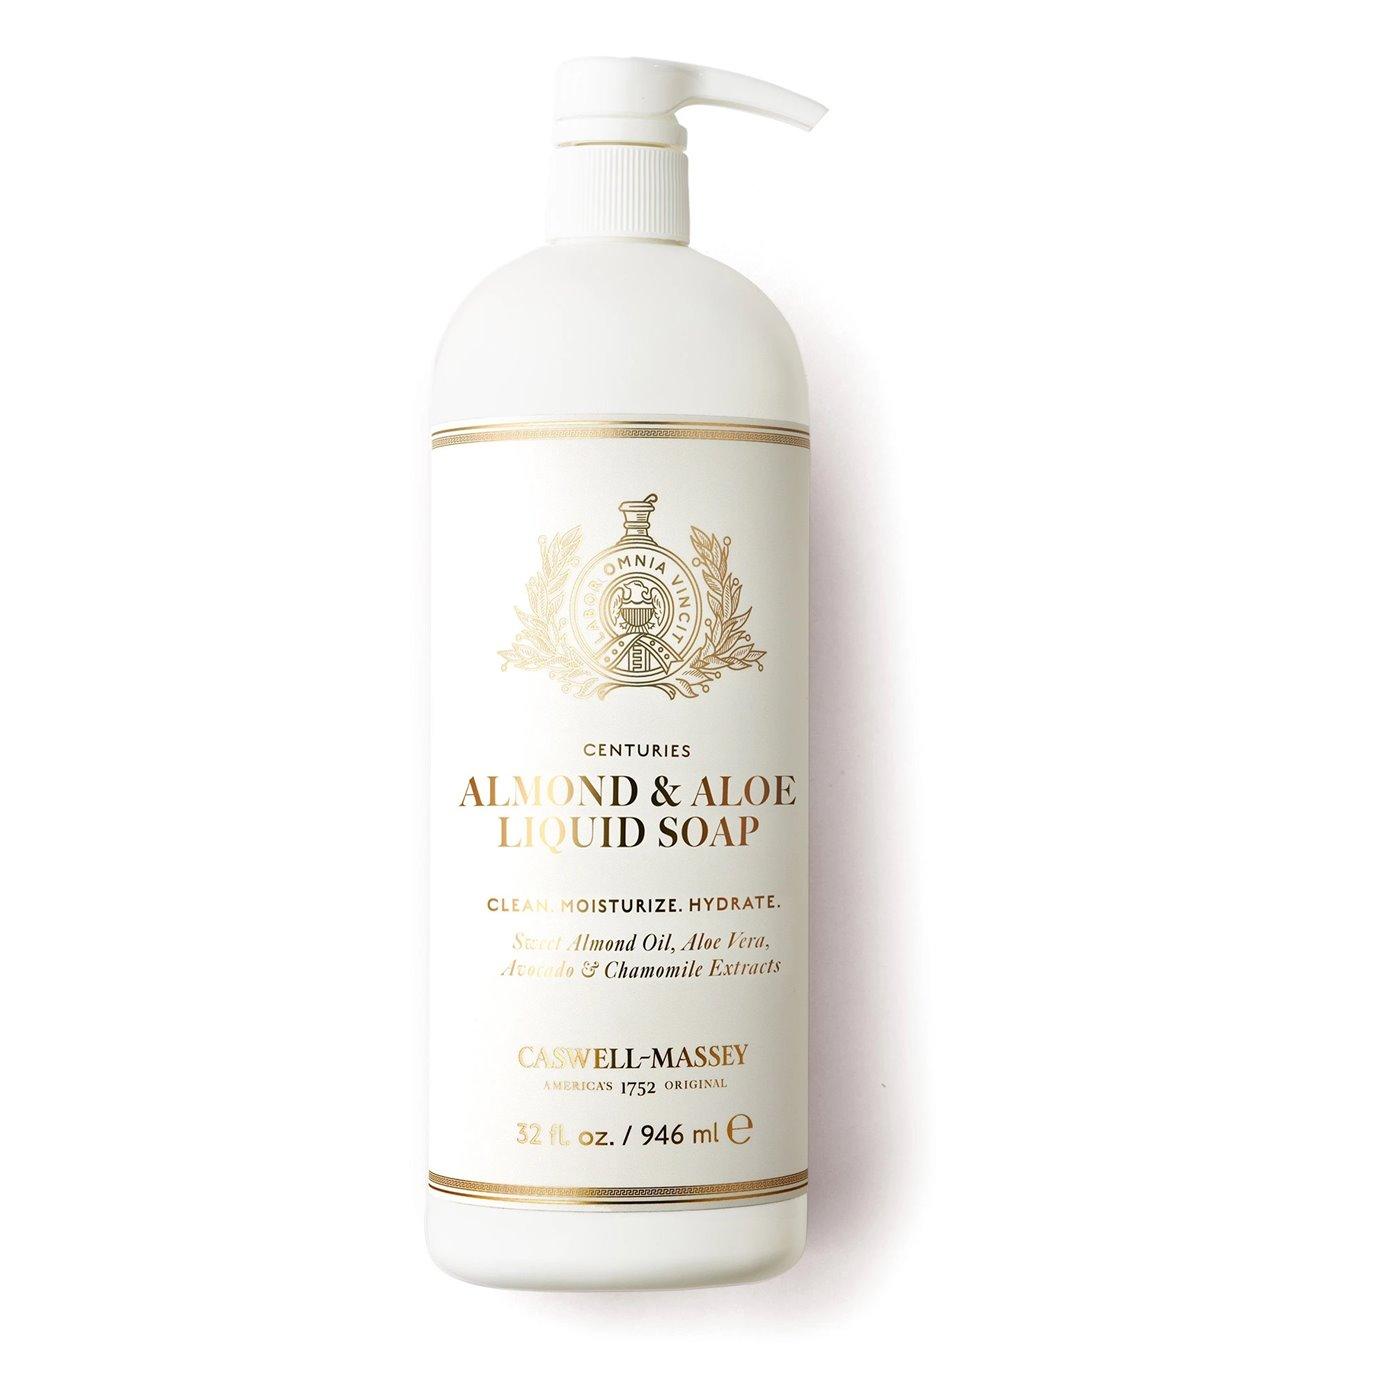 Caswell-Massey Almond & Aloe Liquid Soap 32 oz.